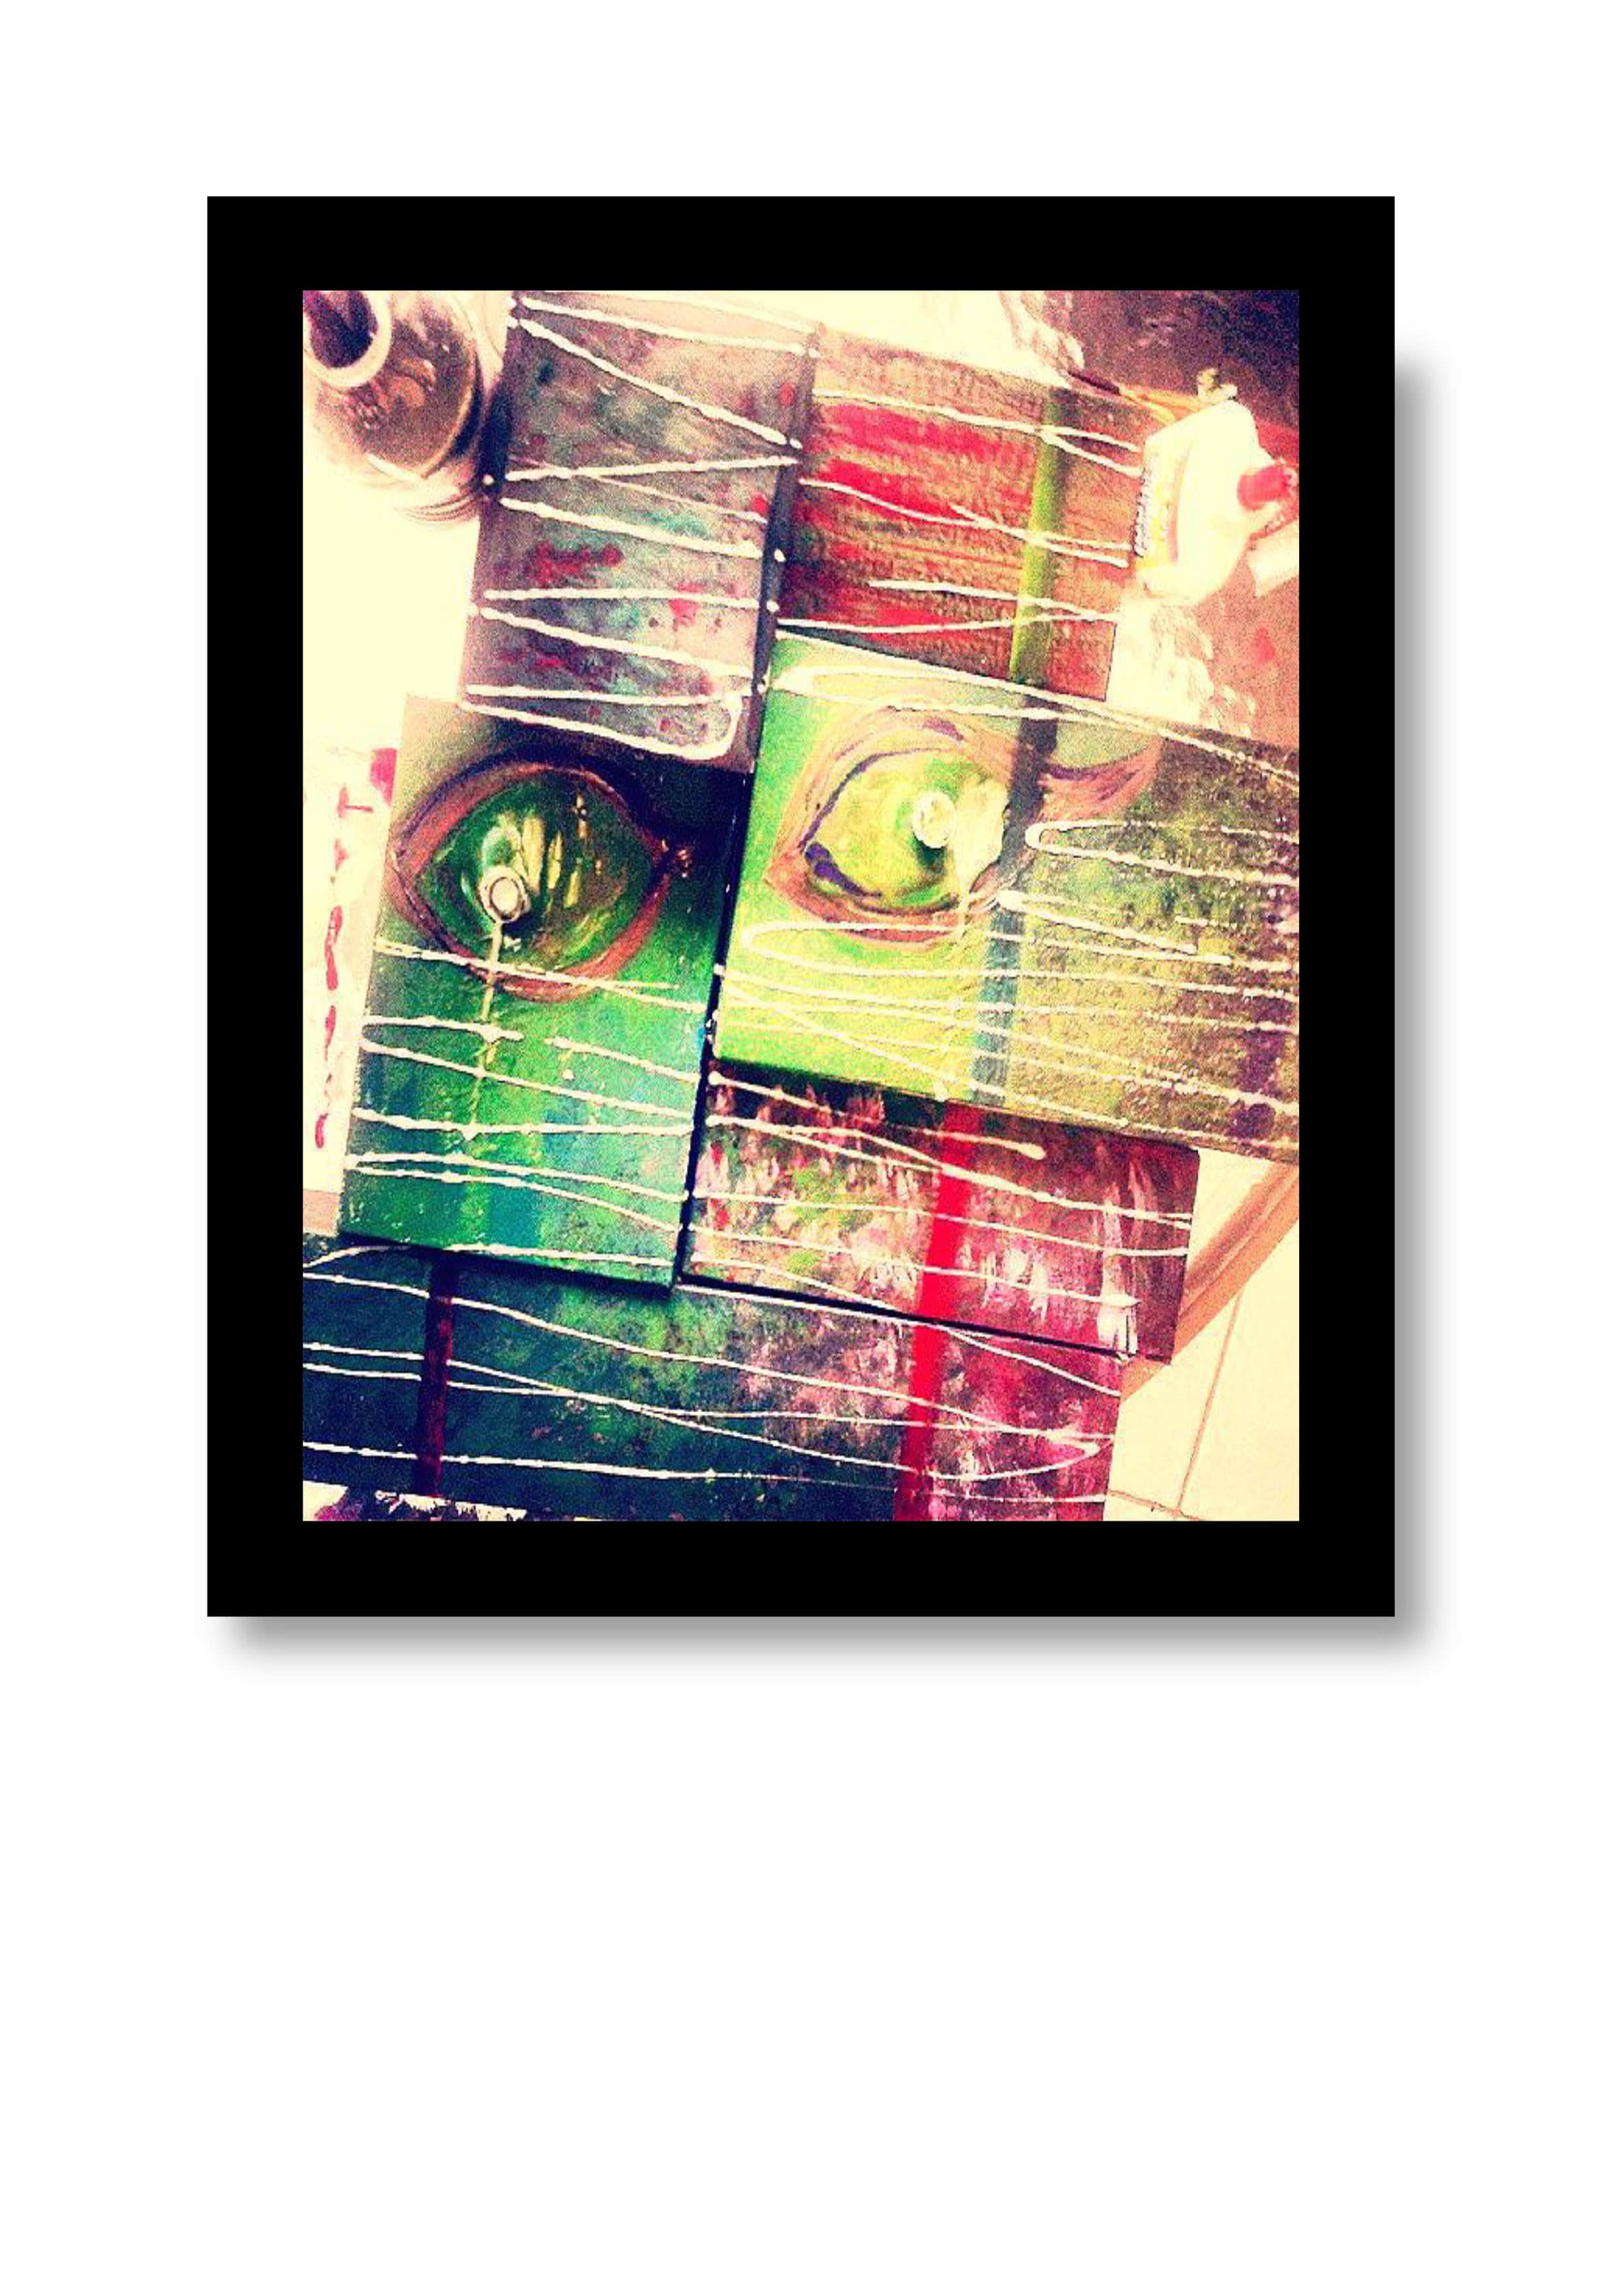 art-portfolio-aglae-corrected-20-min.jpg